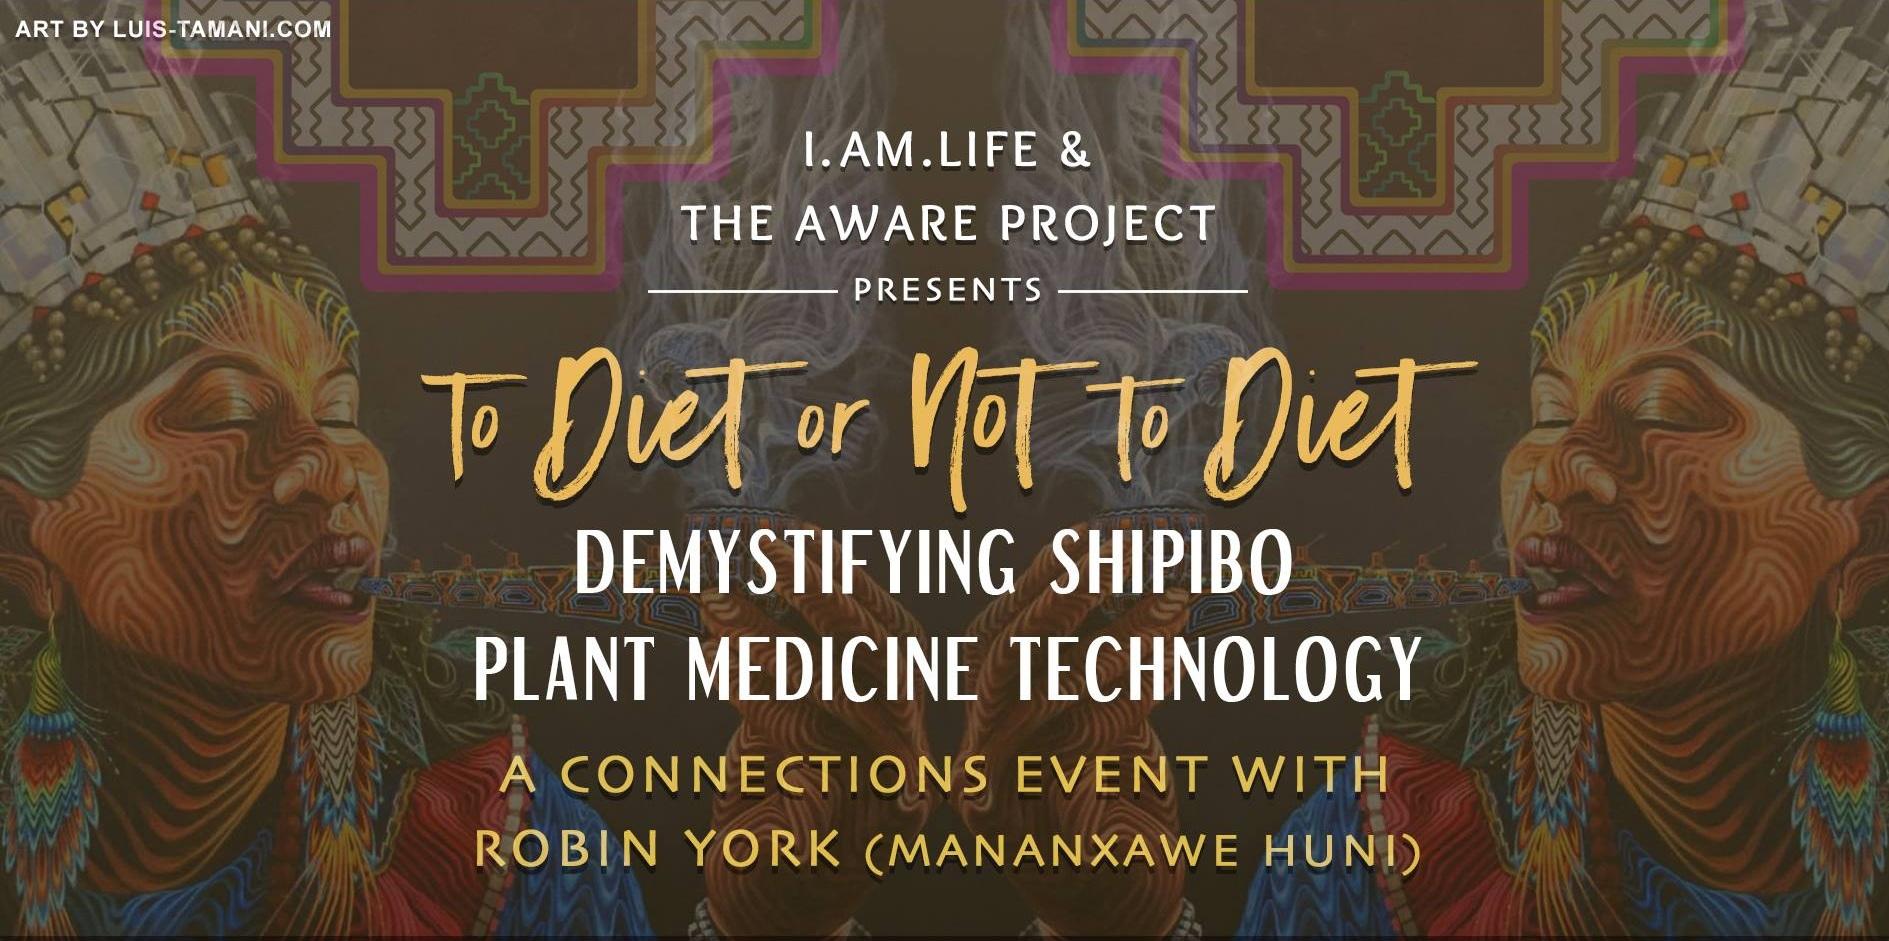 Shipibo Plant Medicine Technology